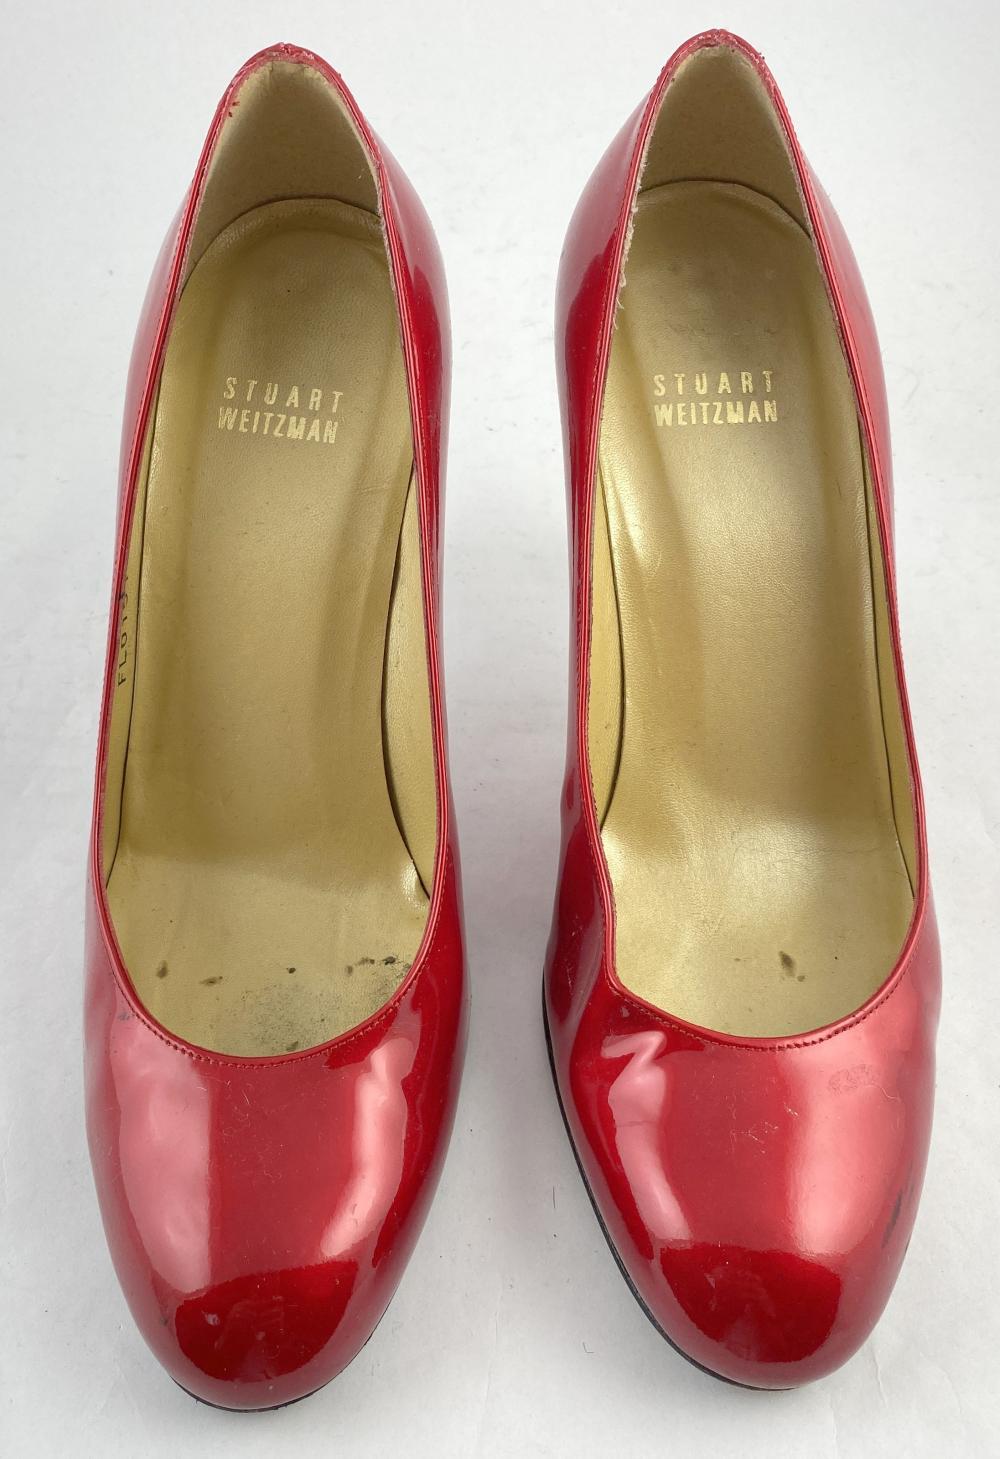 Stuart Weitzman: Crimson Patent Leather Round-Toe Pumps